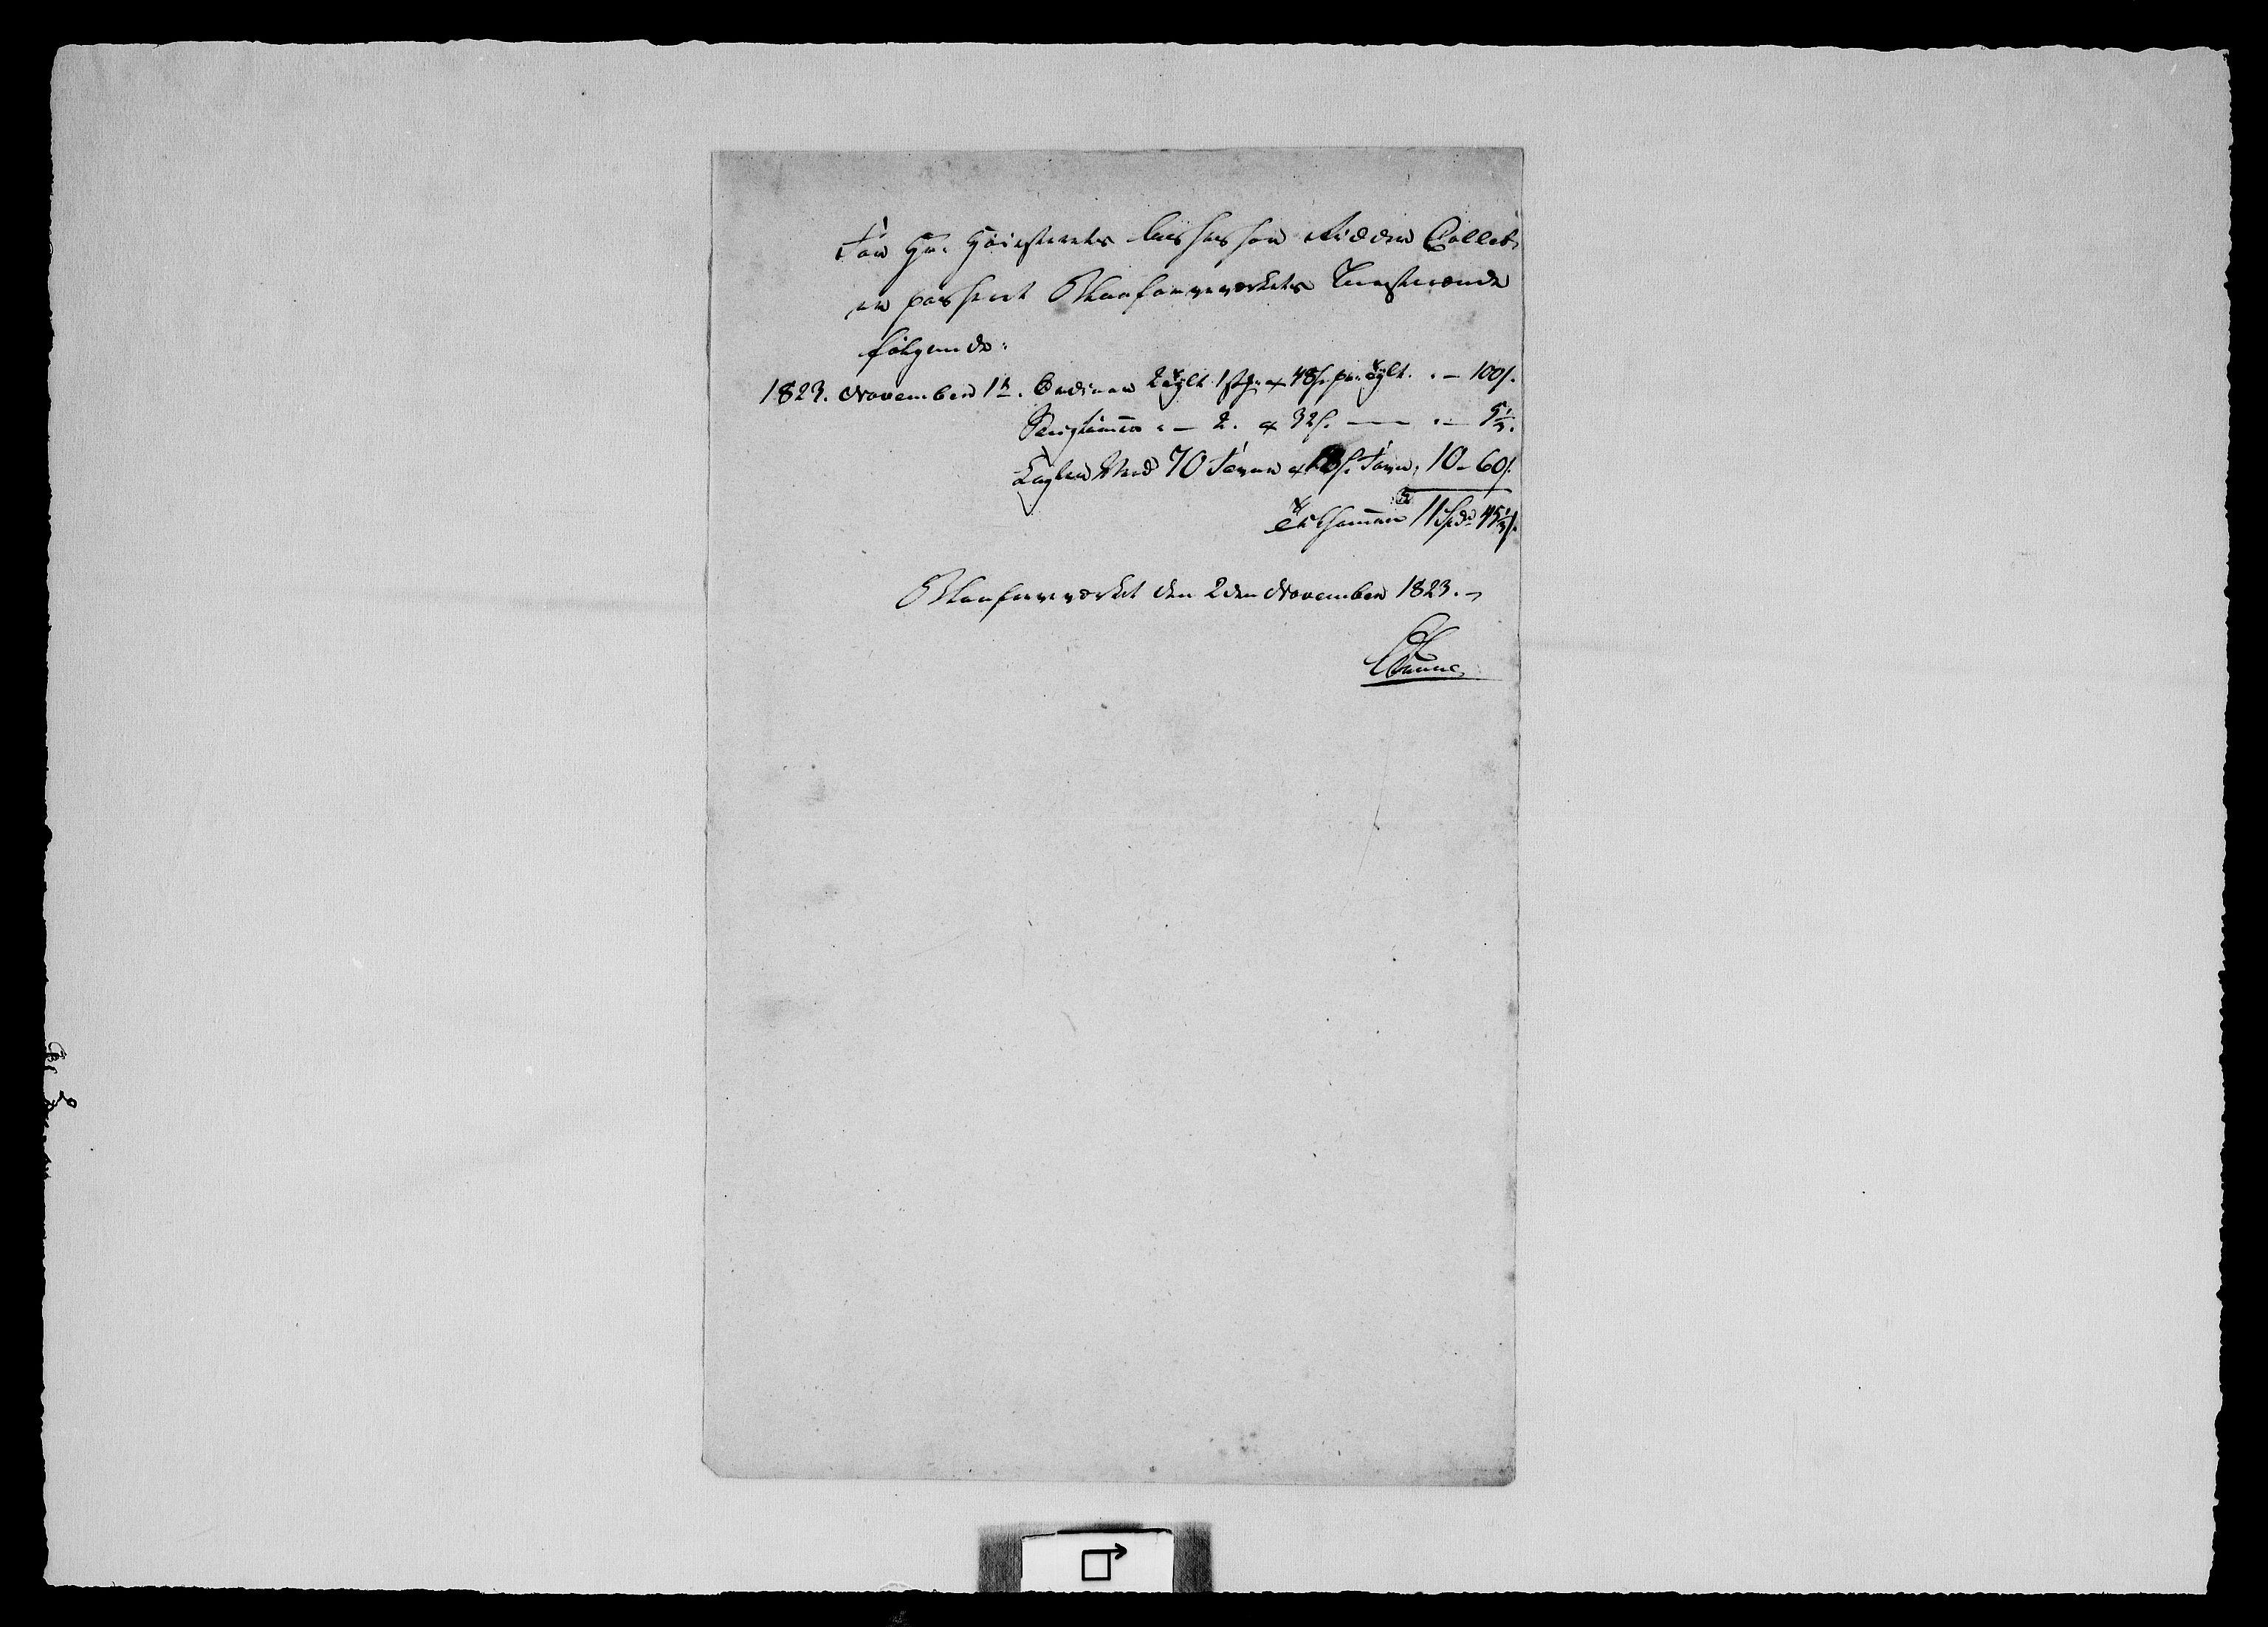 RA, Modums Blaafarveværk, G/Gd/Gdd/L0309, 1827-1859, s. 2